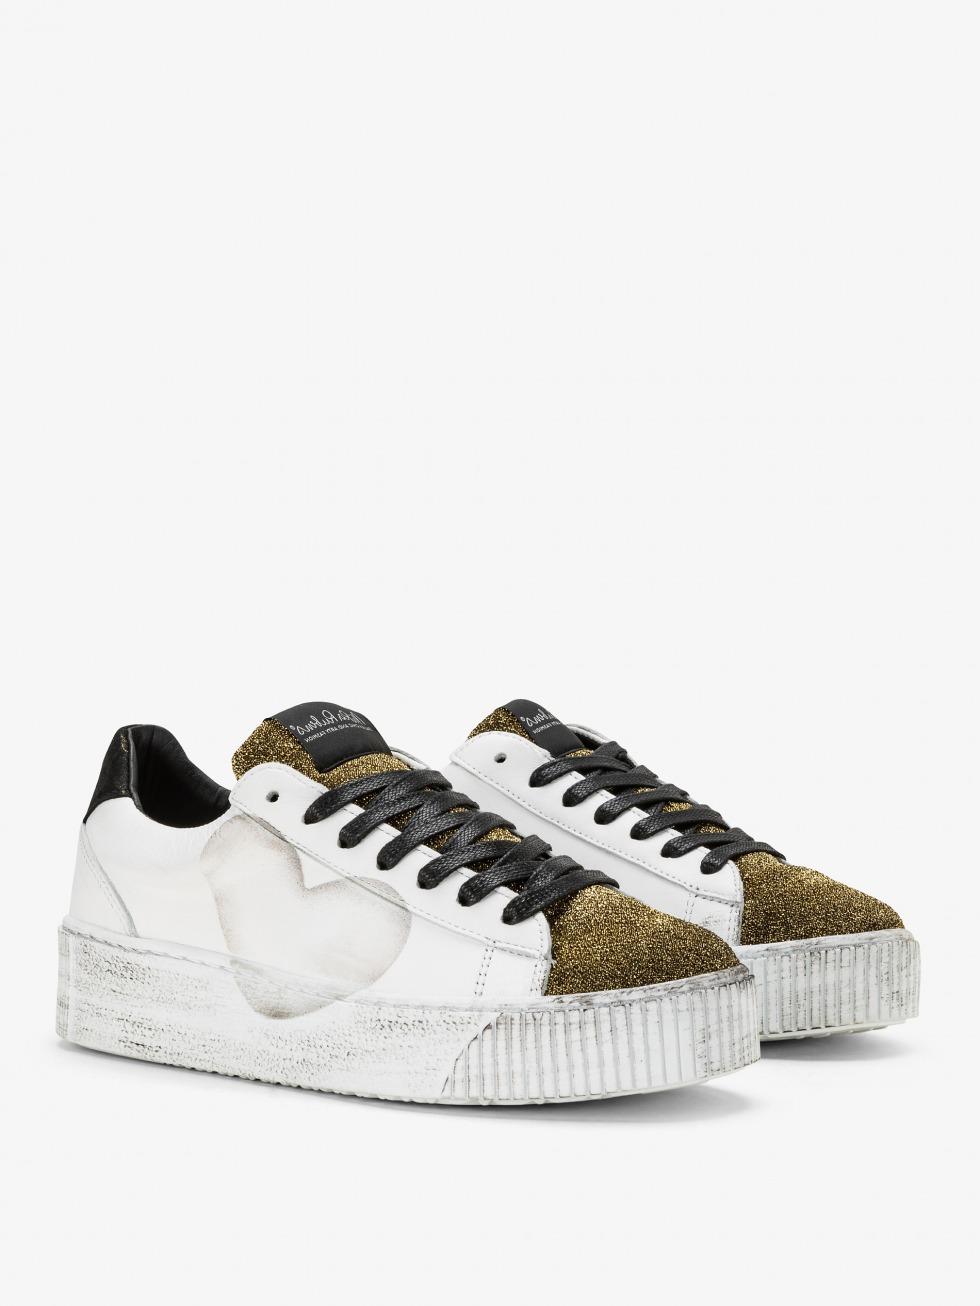 Cosmopolitan Sneakers - Glam Gold Heart